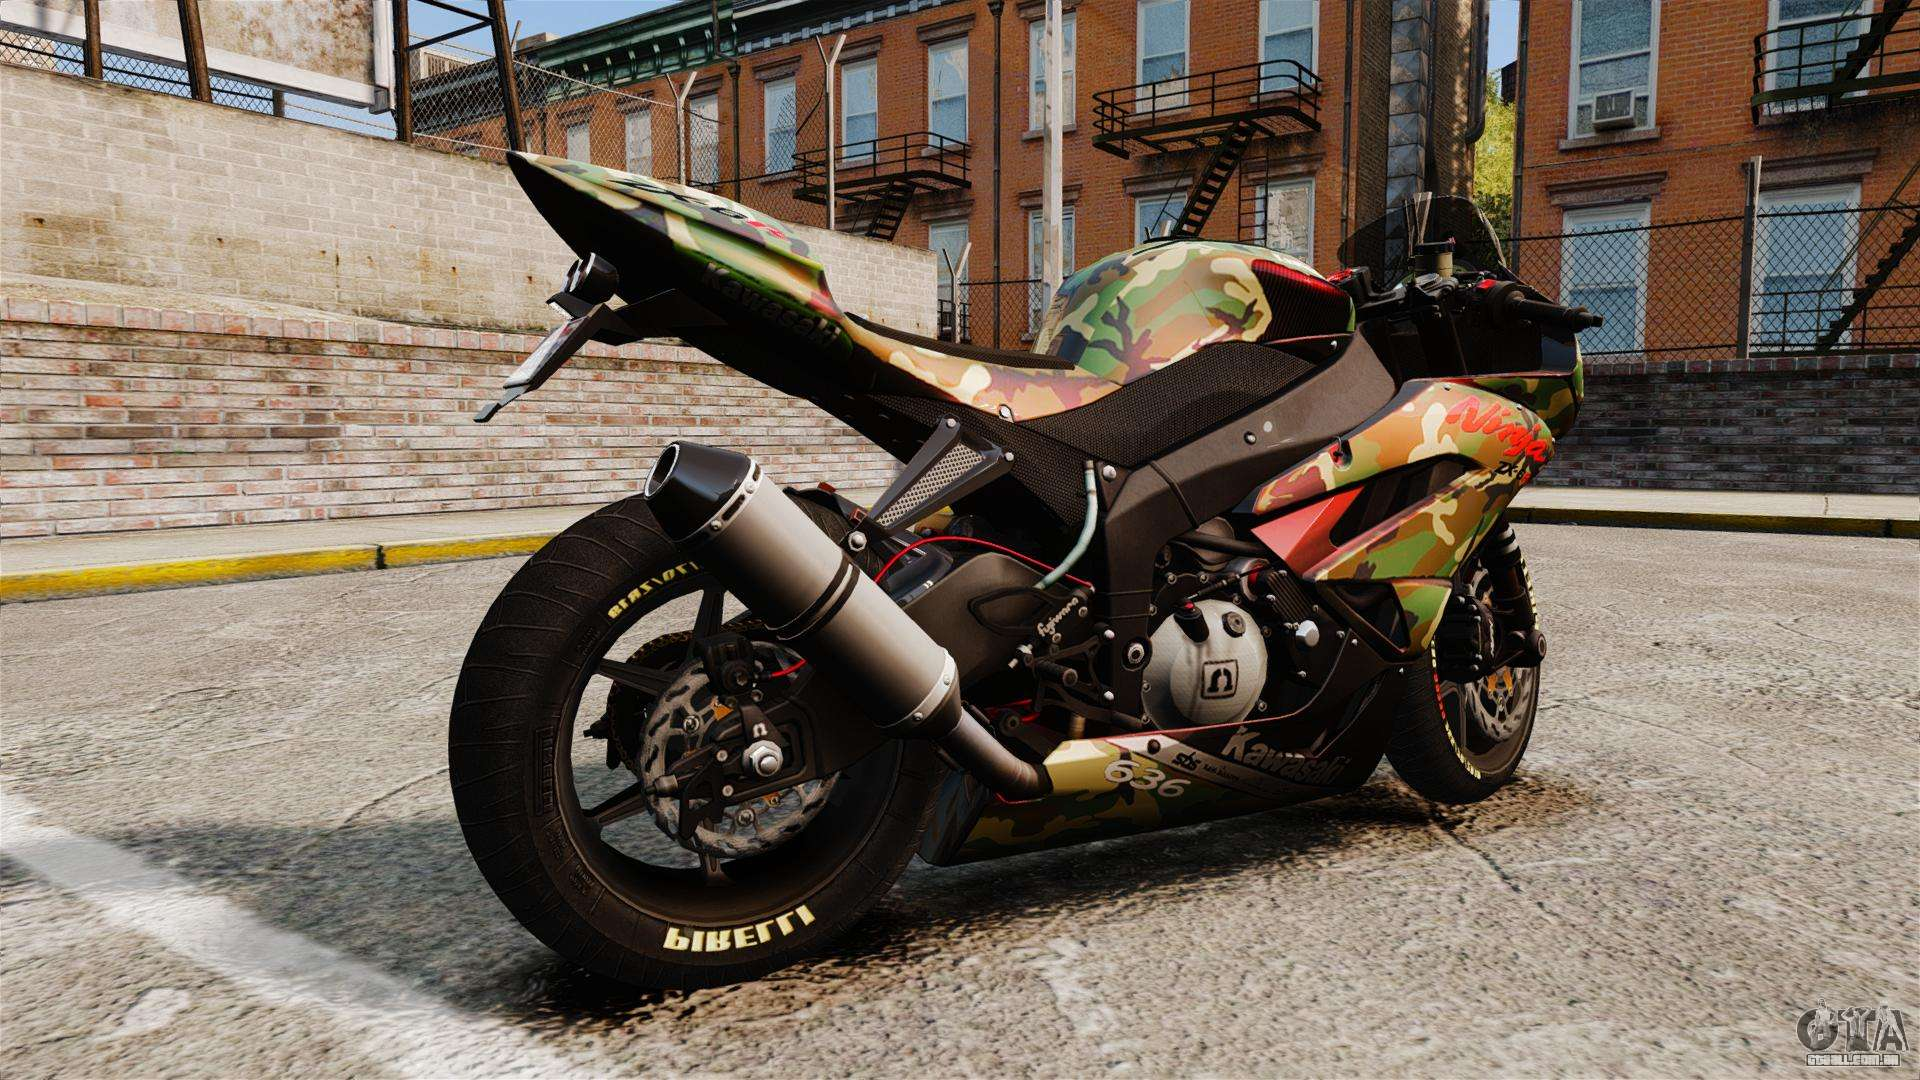 Kawasaki Ninja ZX-6R  № 1588160 бесплатно